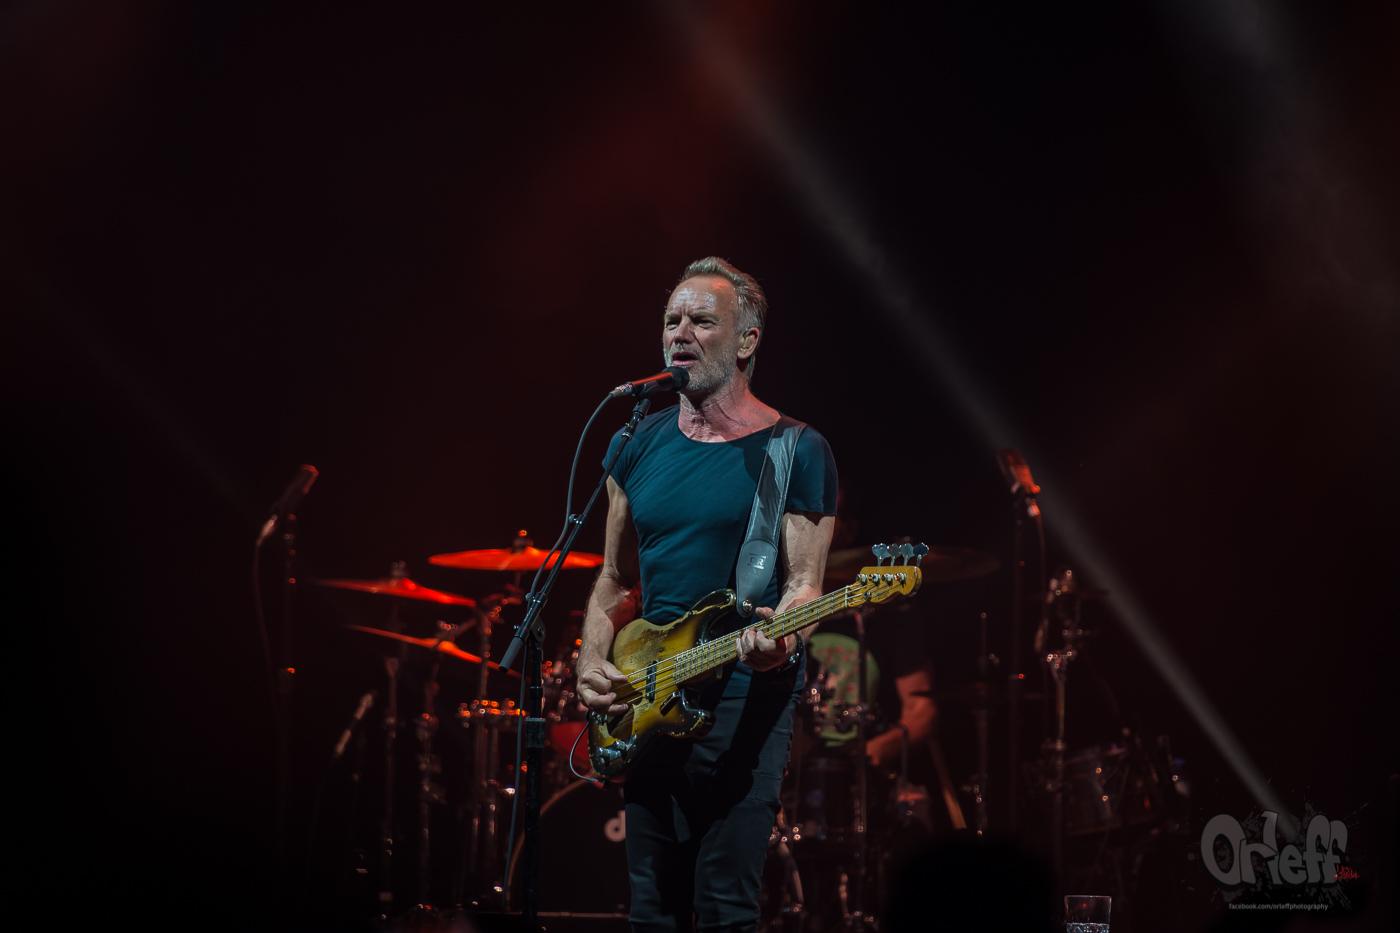 Sting @ Arena Armeets, 2019